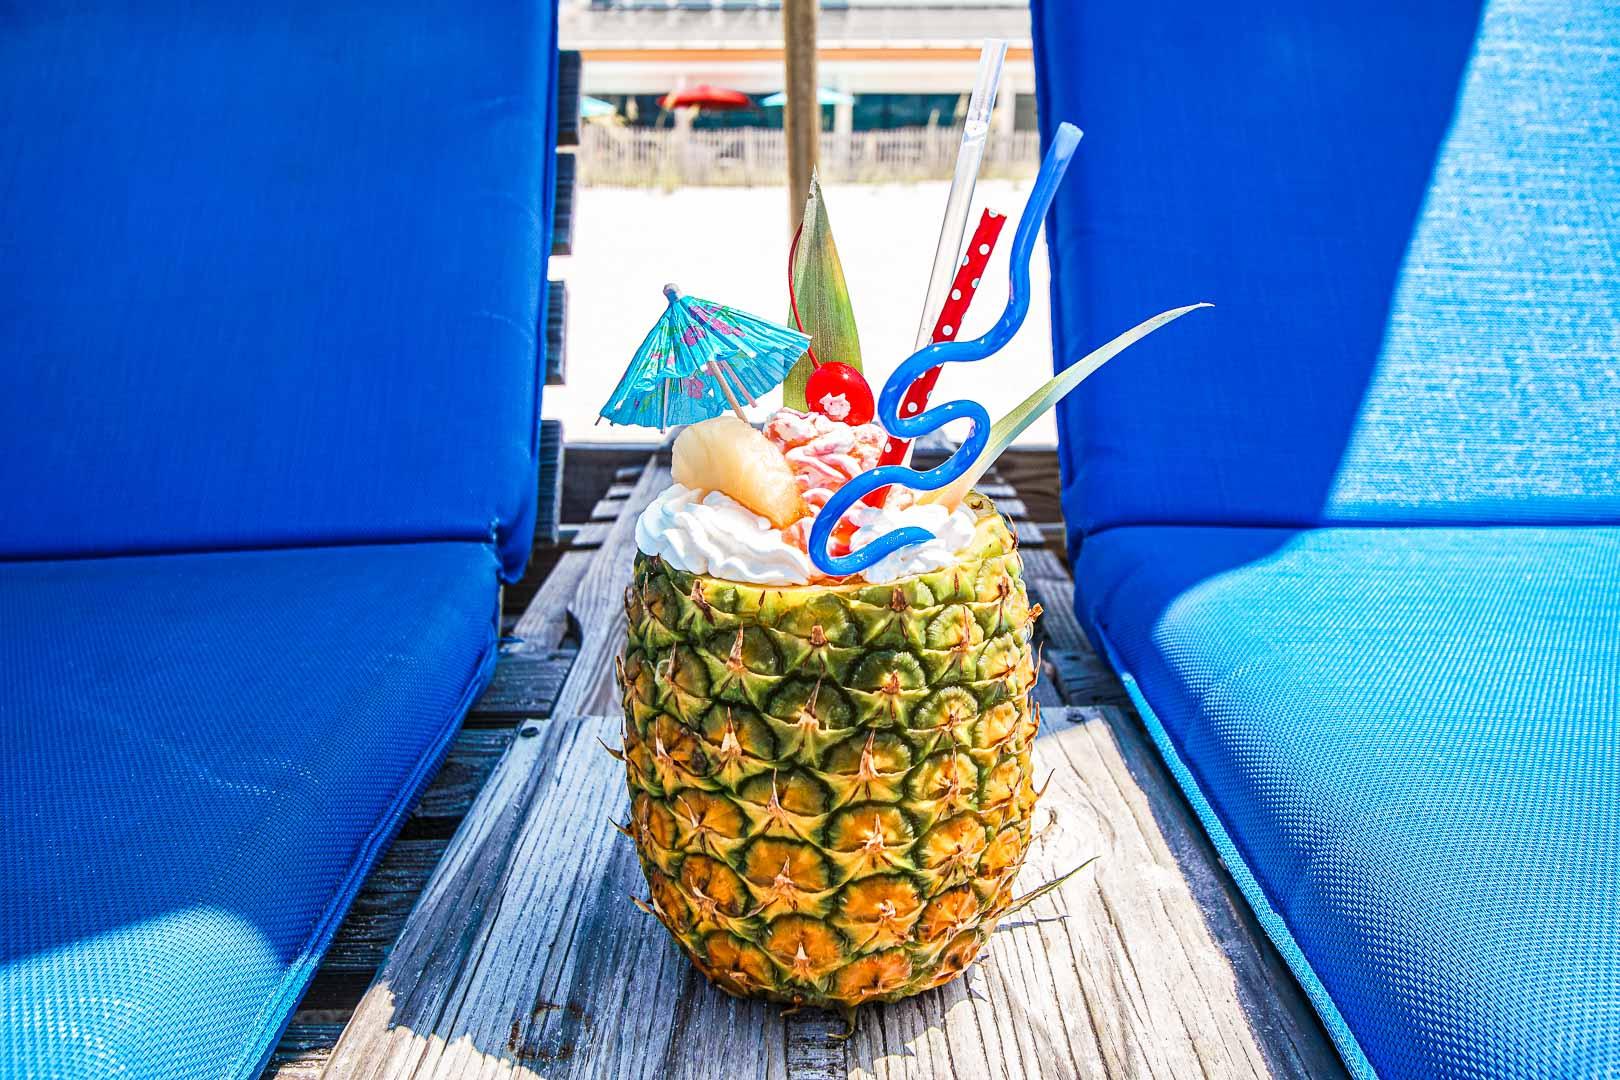 Refreshing Pina colada drinks at VRI's Landmark Holiday Beach Resort in Panama City, Florida.